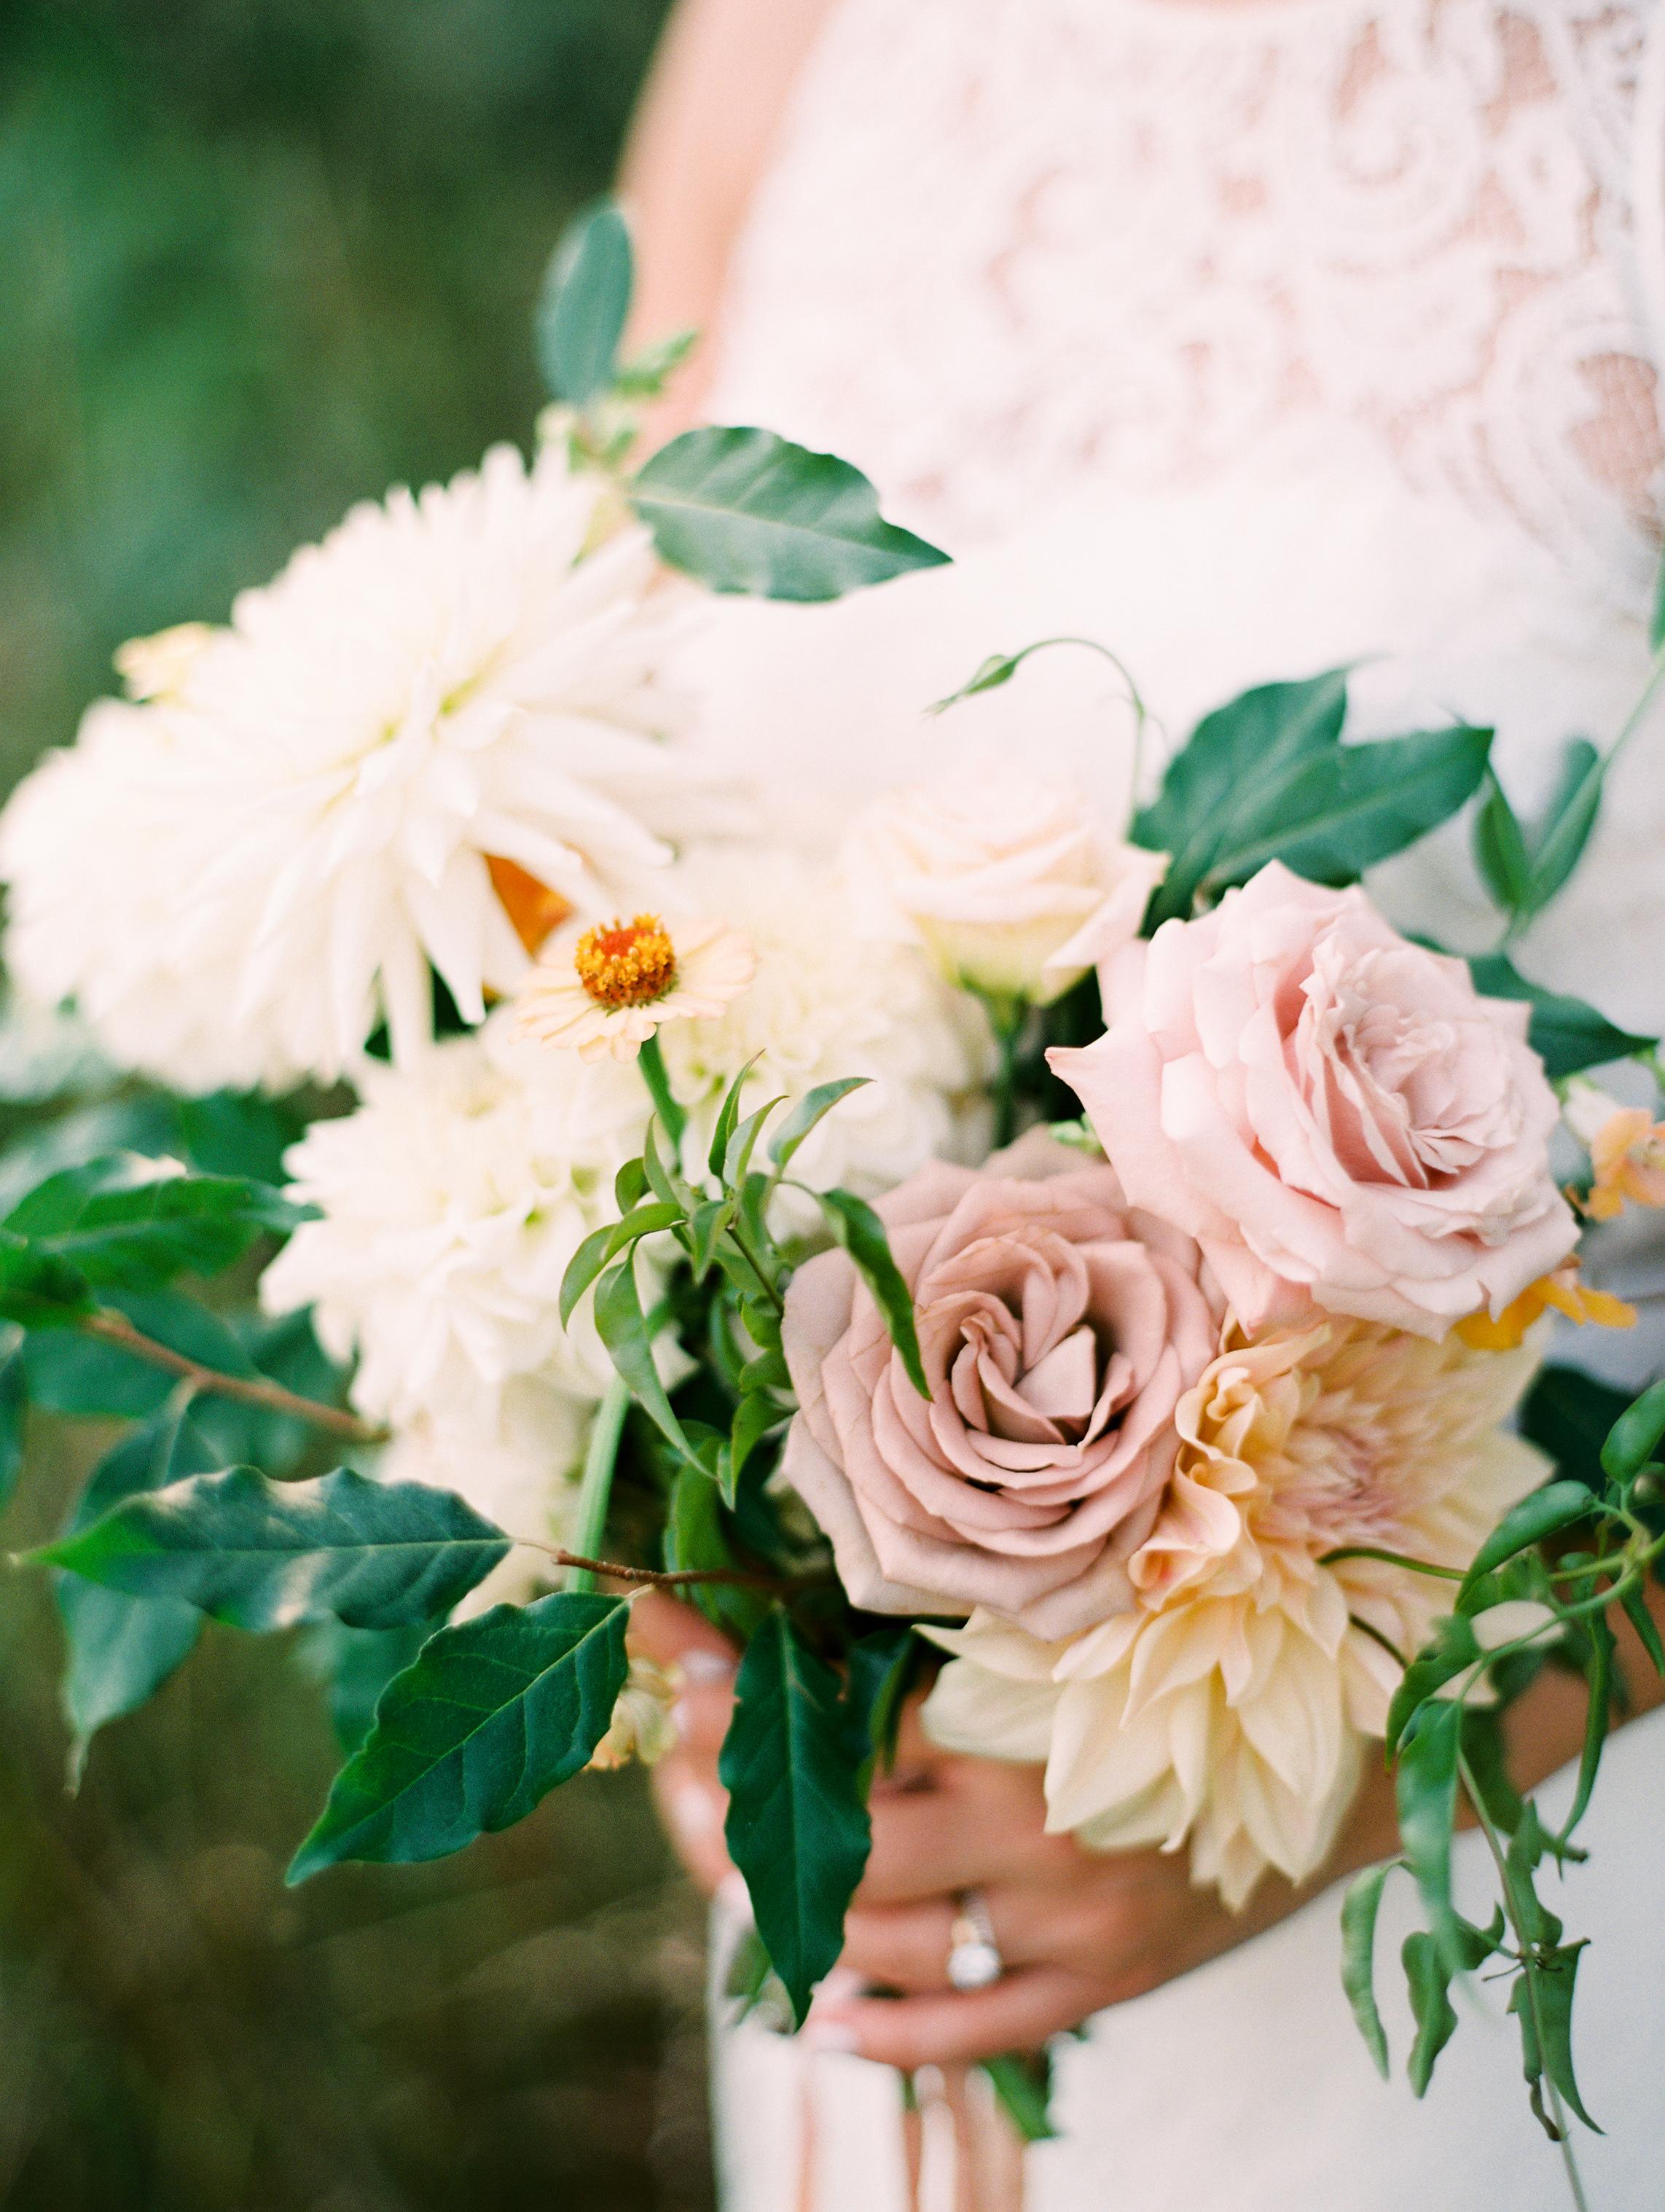 Zoller+Wedding+Reception+BridalPortraits-4.jpg